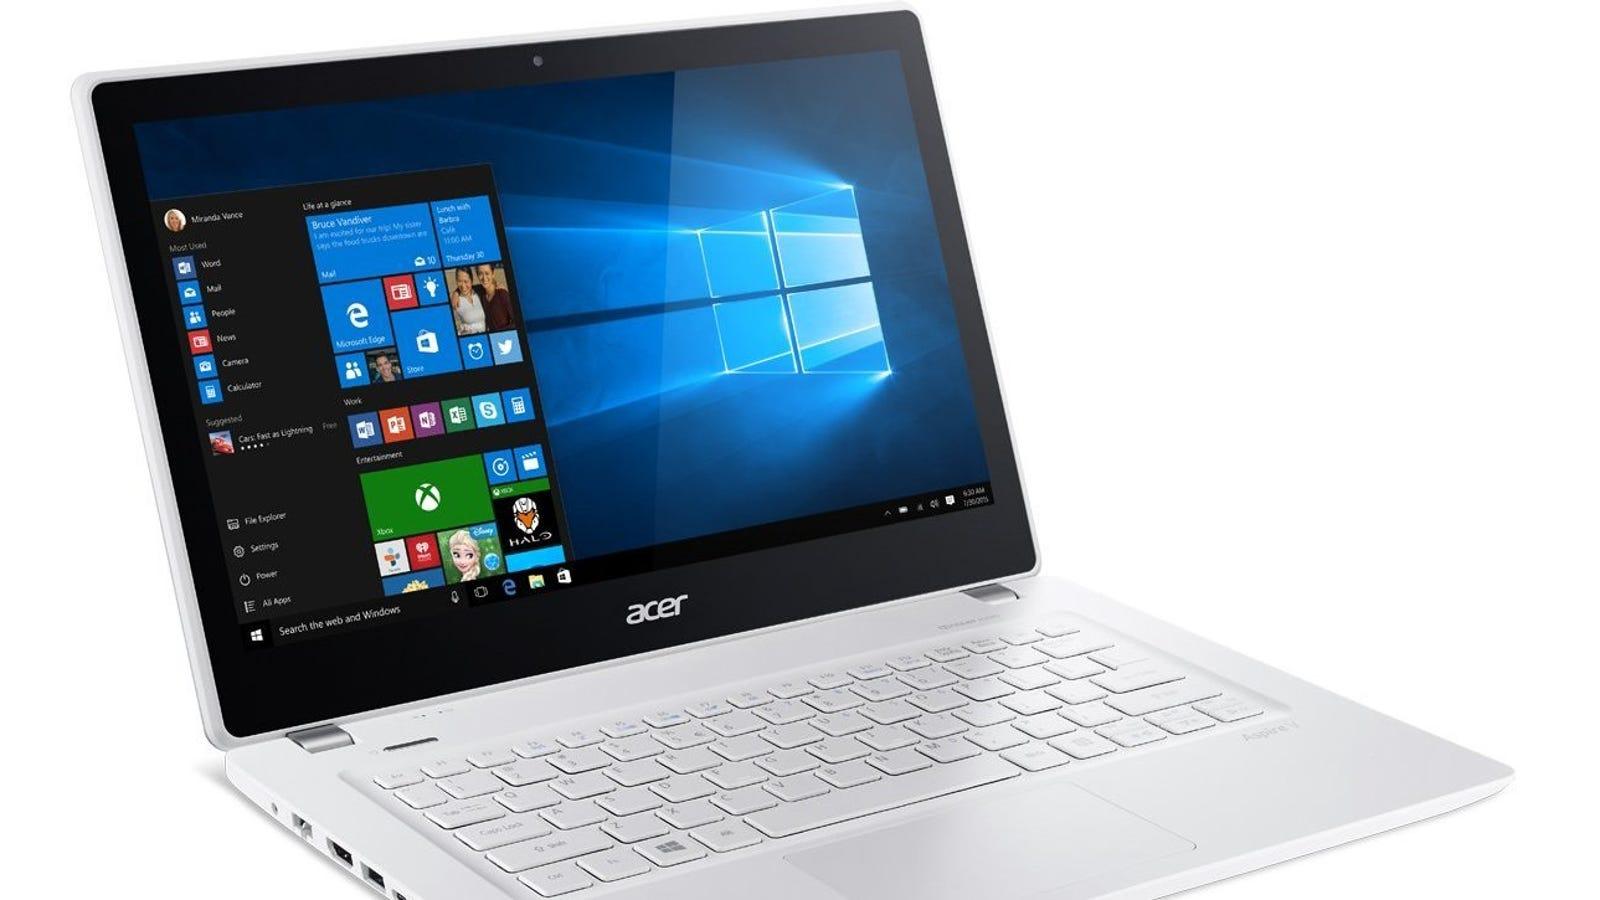 Why Does My Laptop Kill My Wifi?